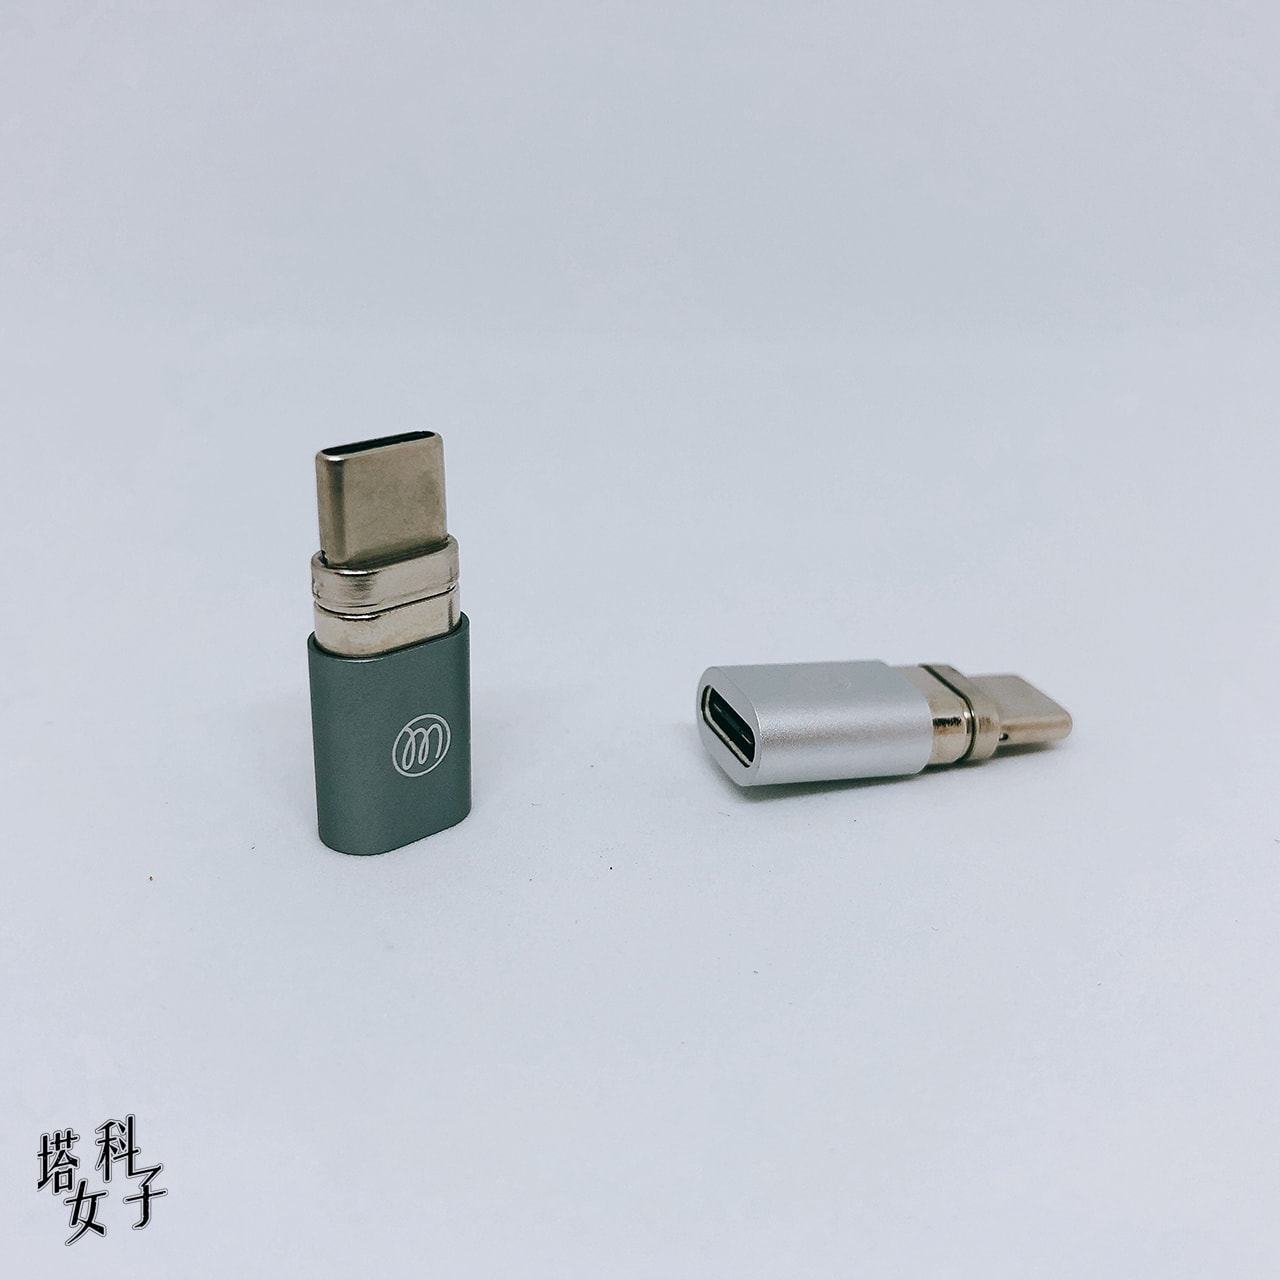 iEasy USB-C 磁吸轉接頭